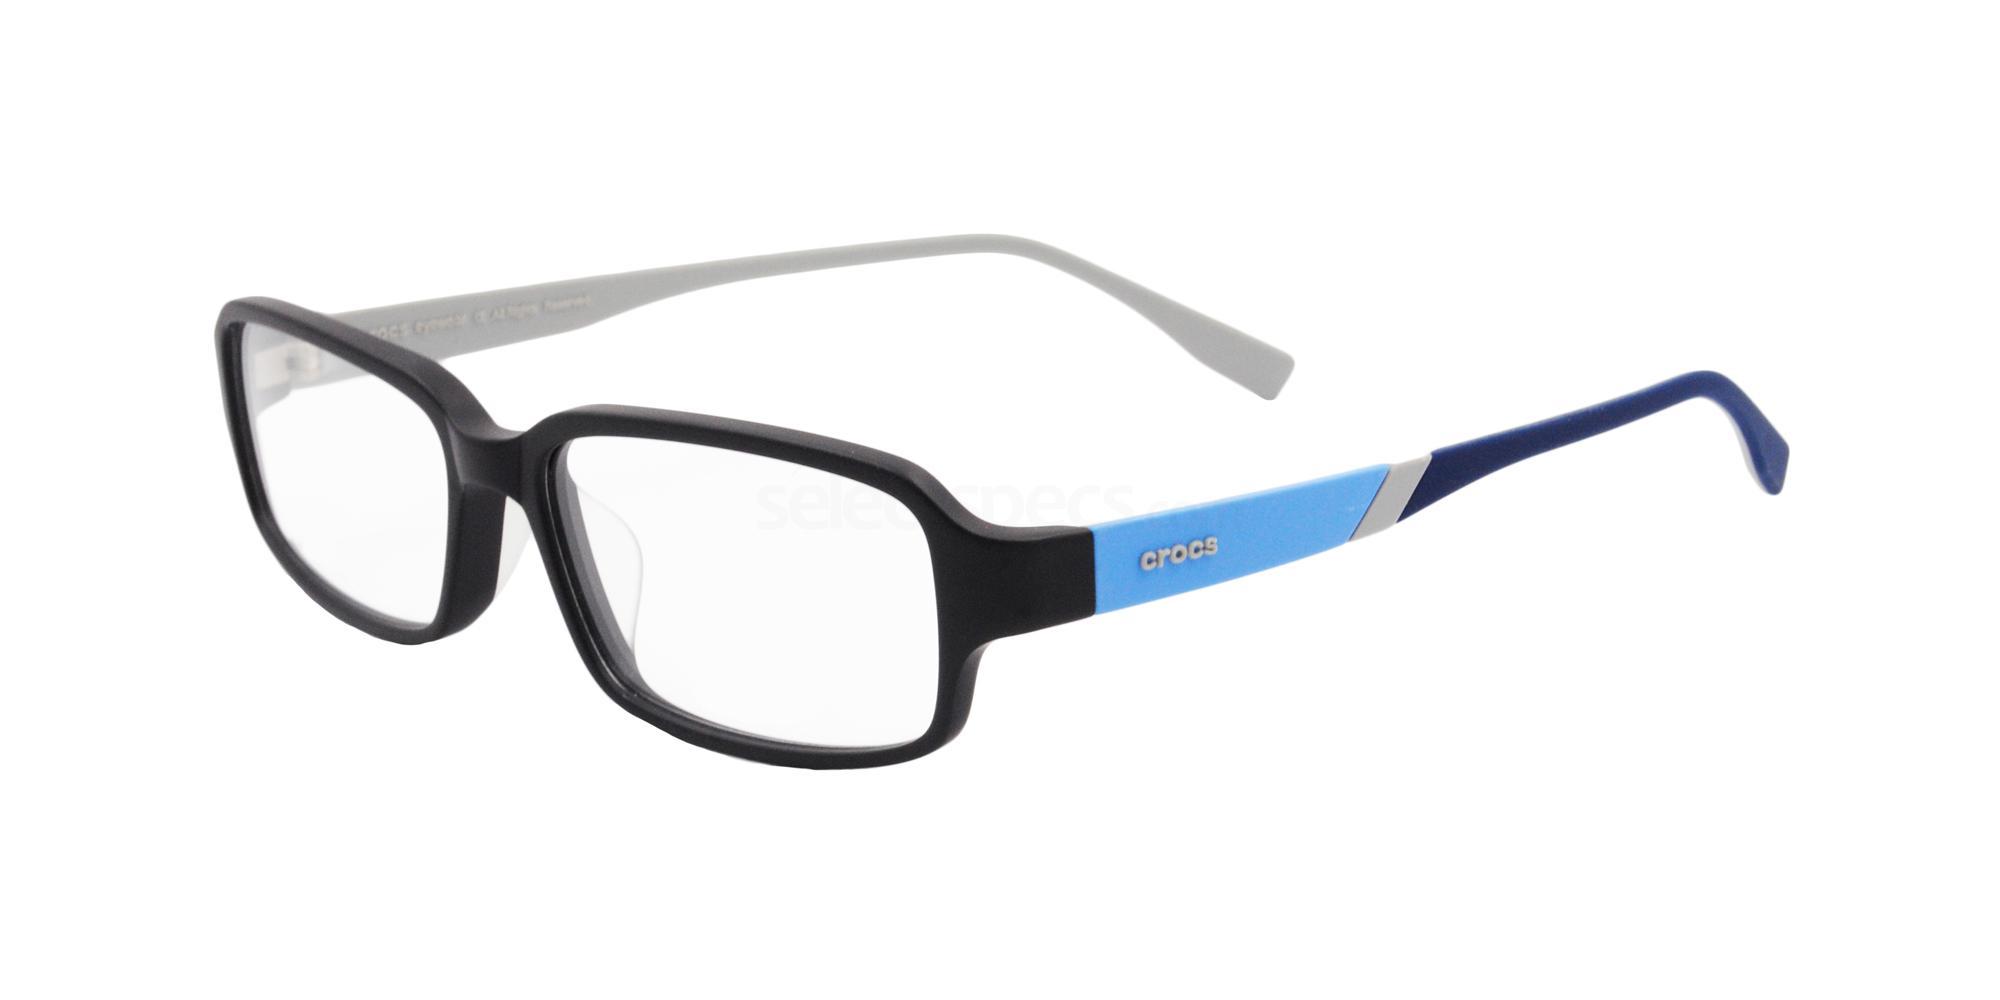 20GY CF3005 Glasses, Crocs Eyewear